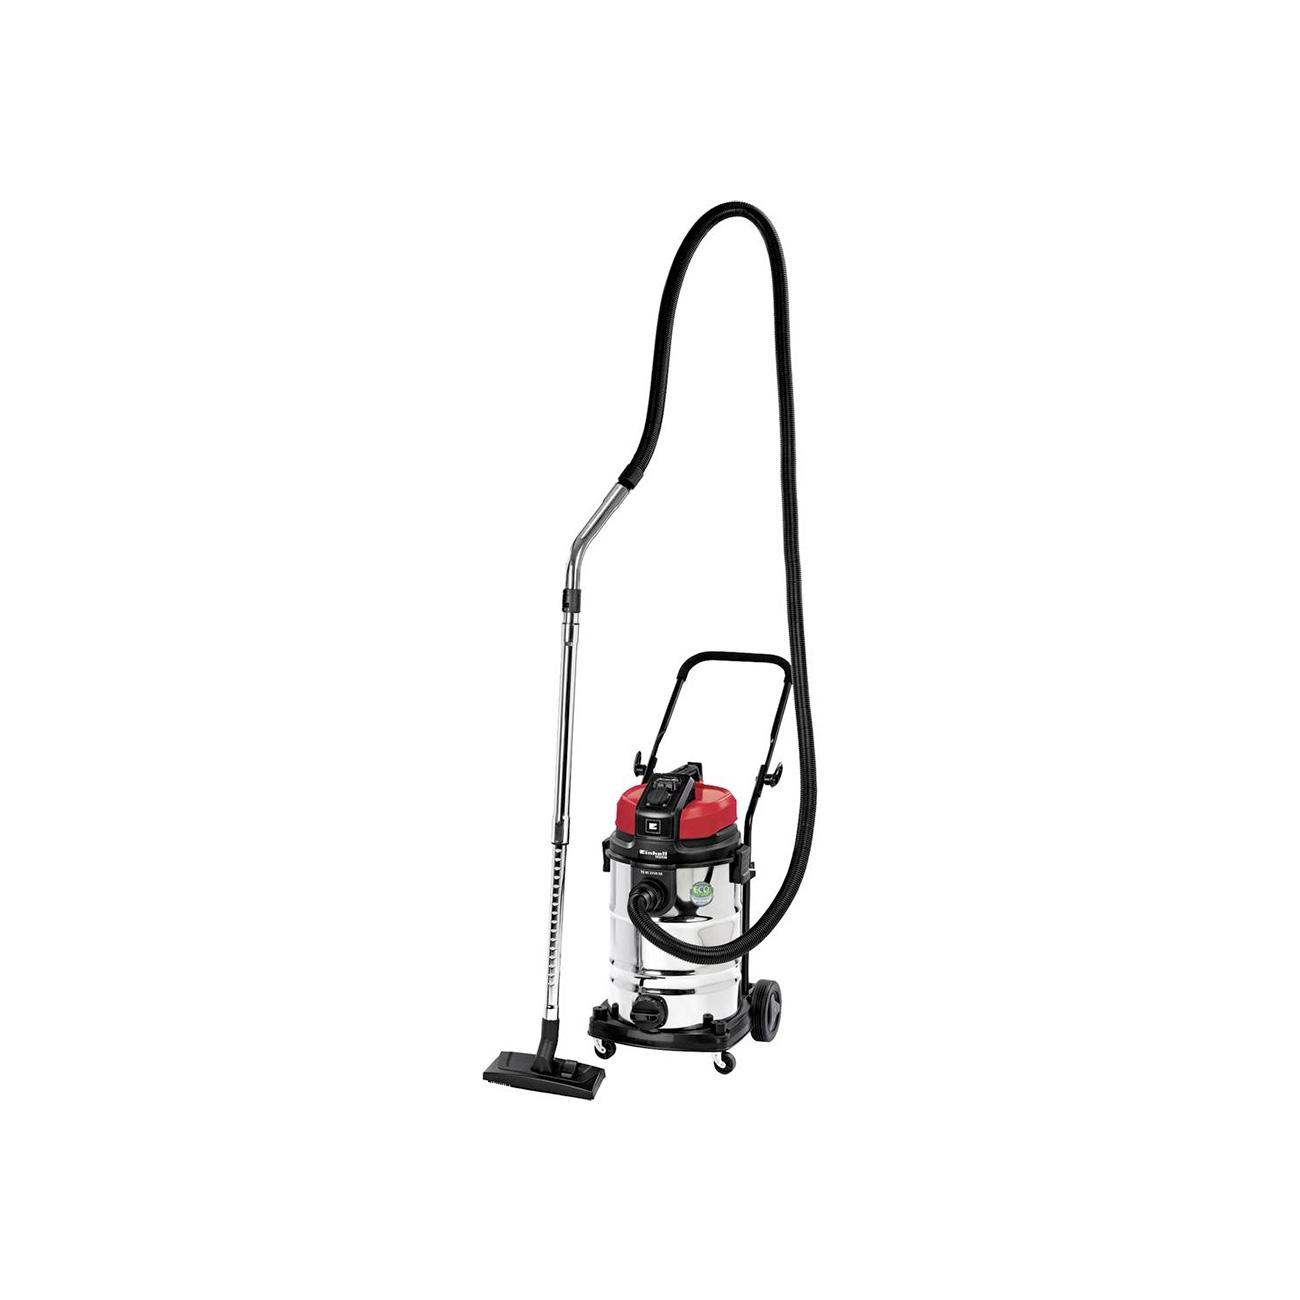 Aspiradora de agua y polvo Einhell TE-VC 2230 SA